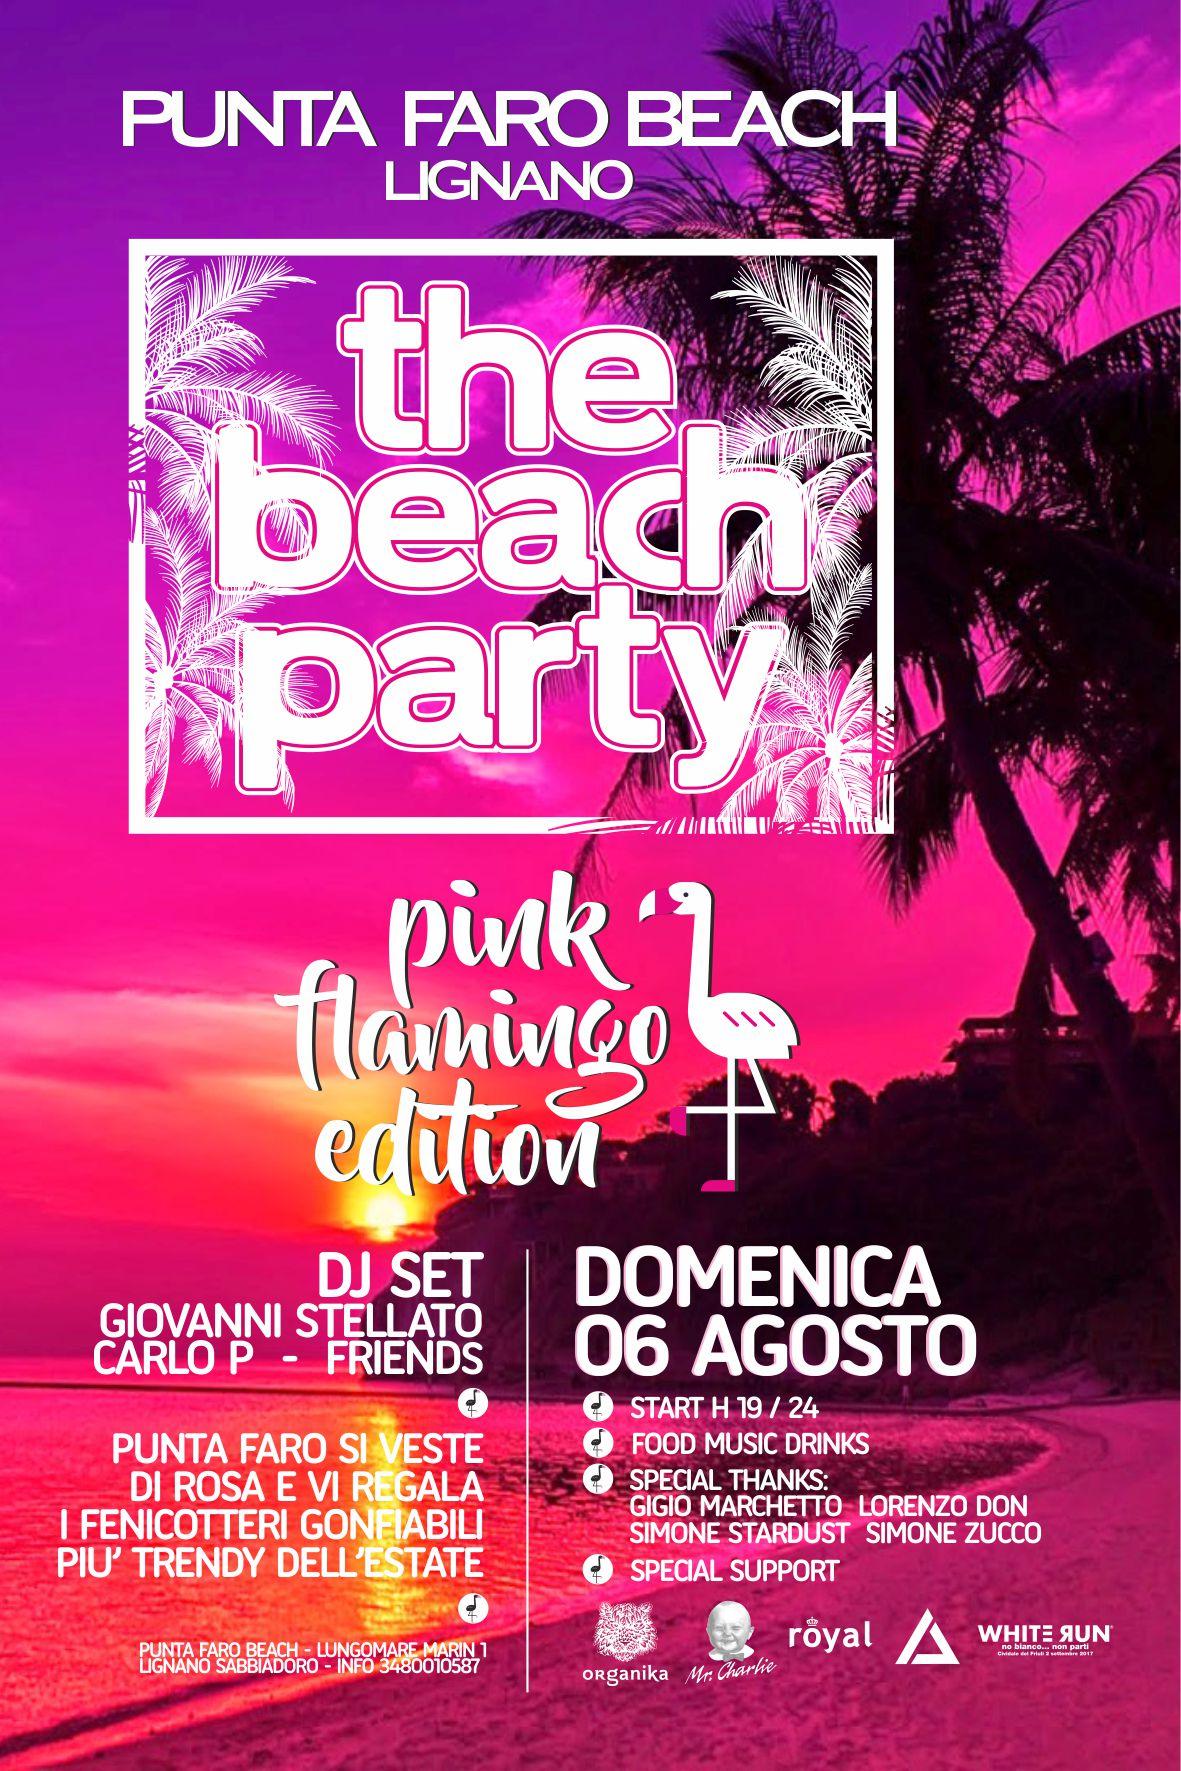 hola pf 2017 06 AGOSTO PINK B R Punta faro Lignano   the beach party 6 agosto DJ set